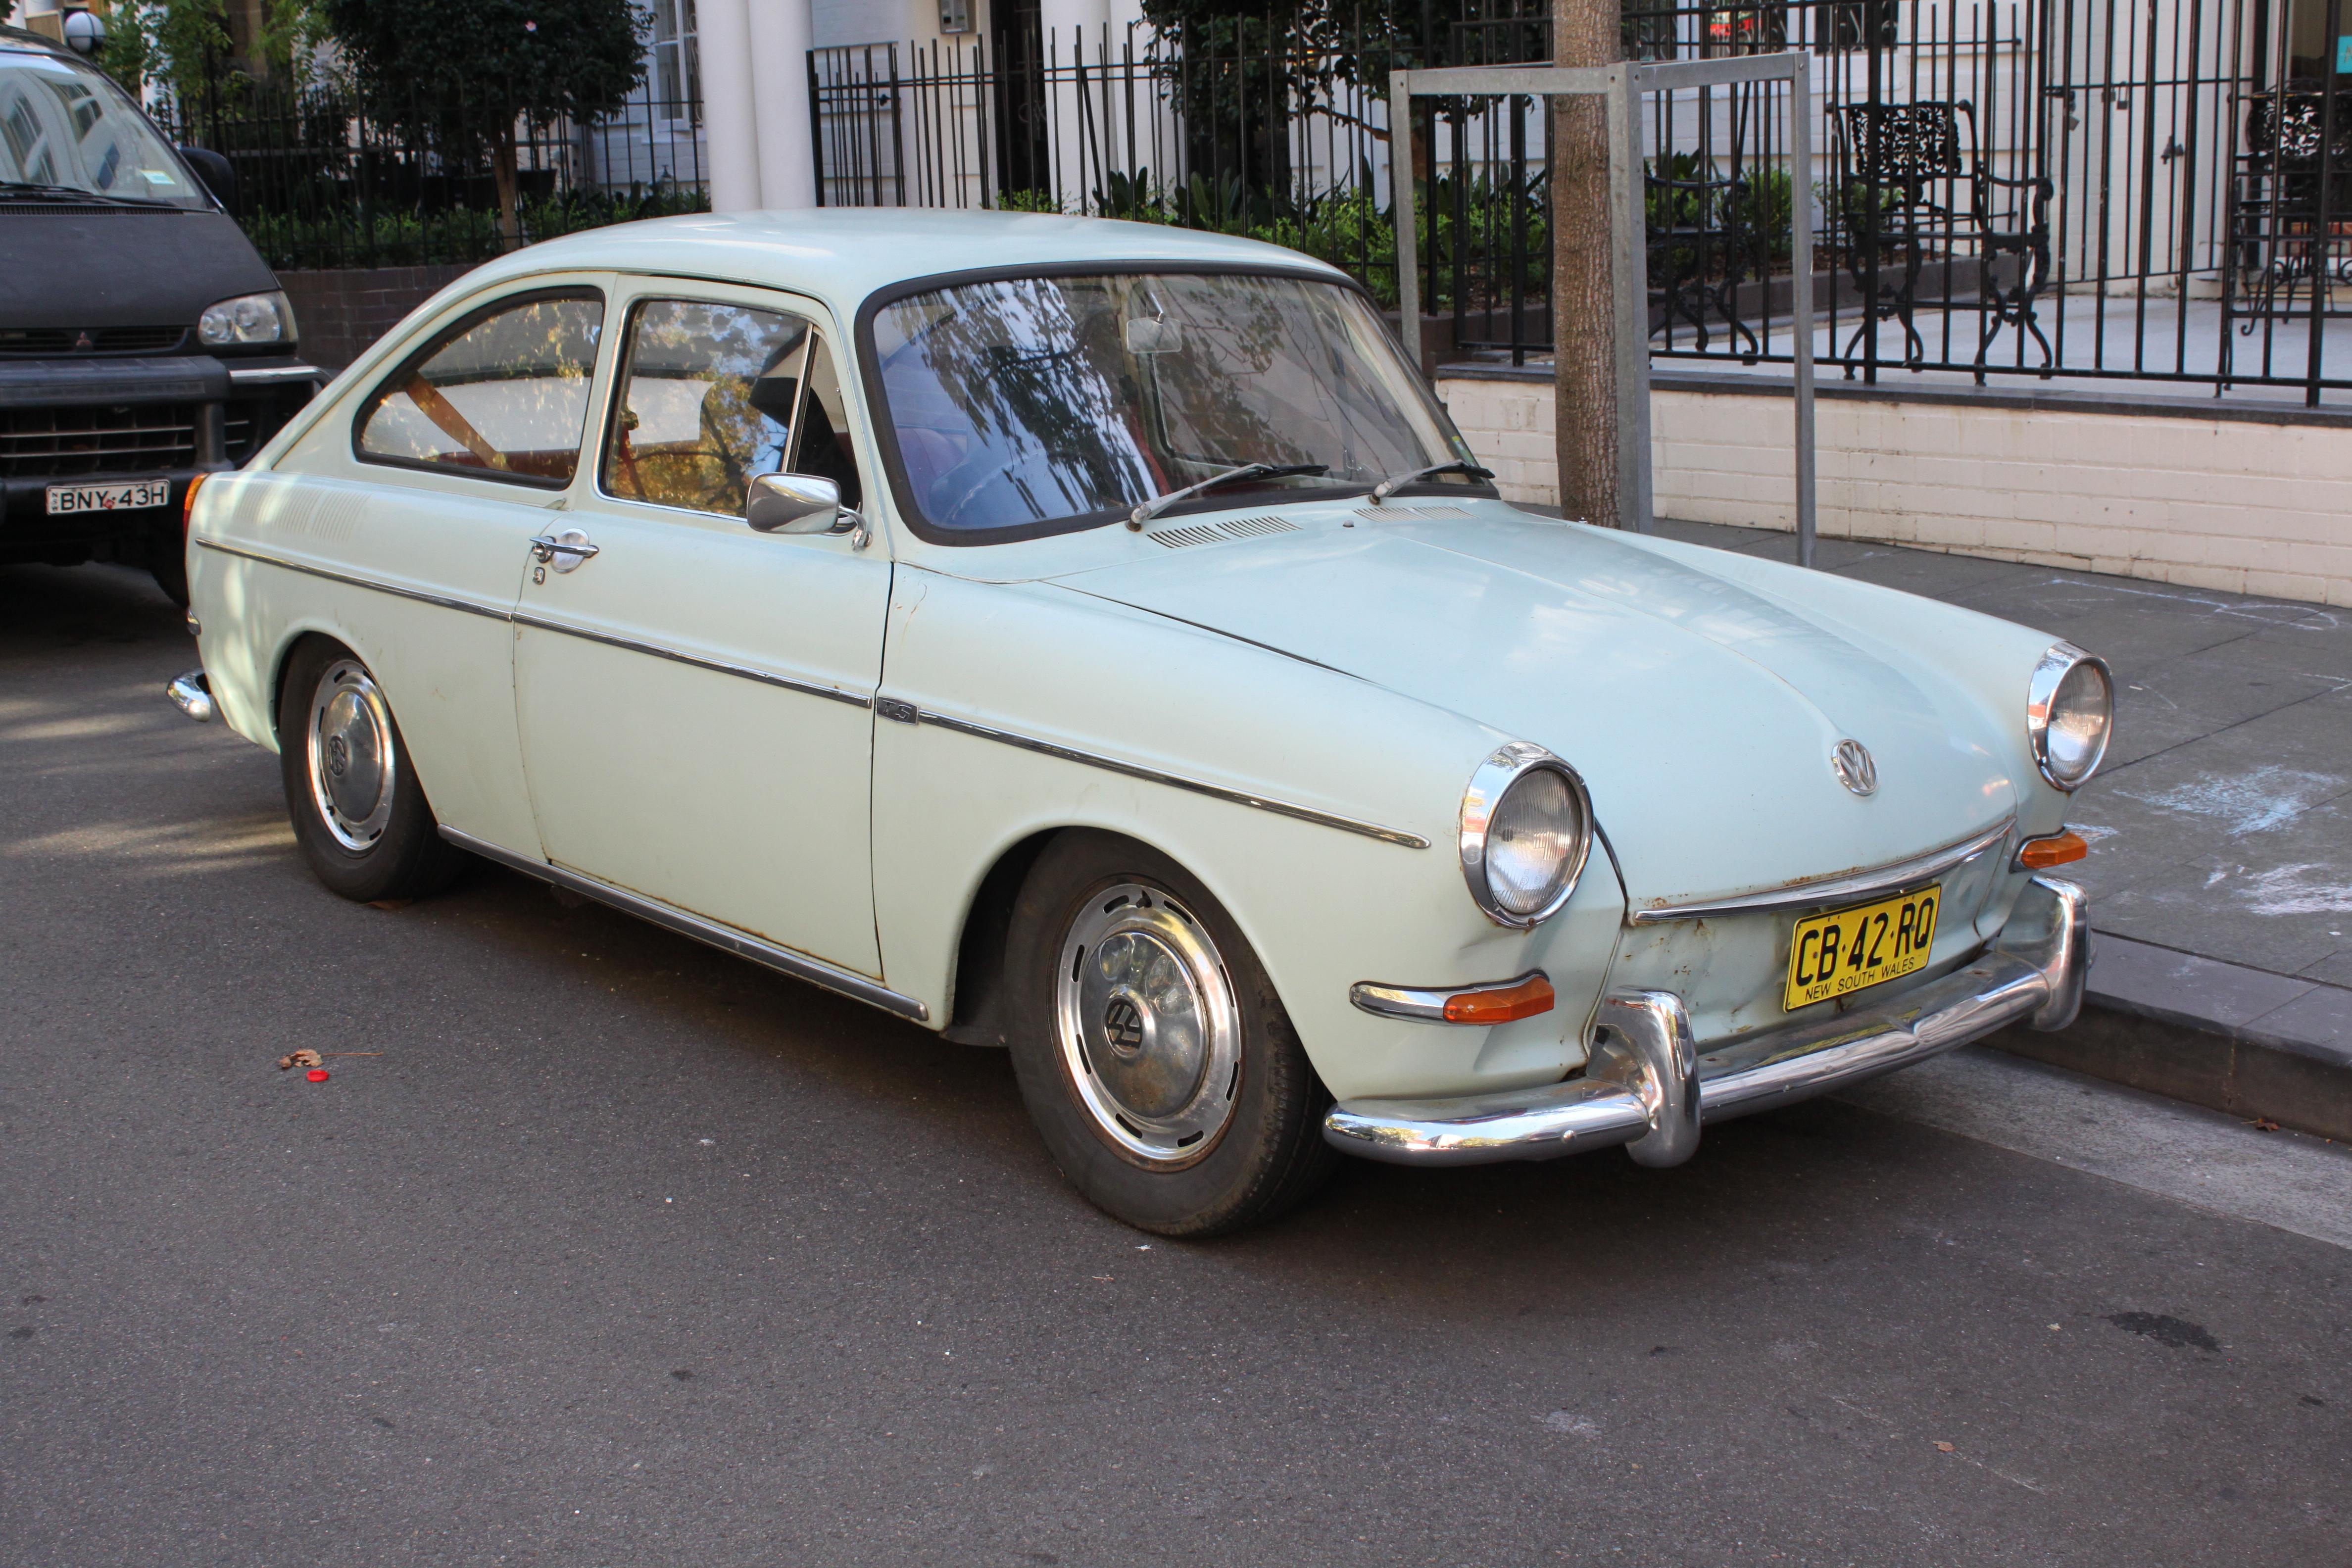 file 1966 volkswagen 1600 type 3 tl fastback sedan 25601122890 jpg wikimedia commons. Black Bedroom Furniture Sets. Home Design Ideas